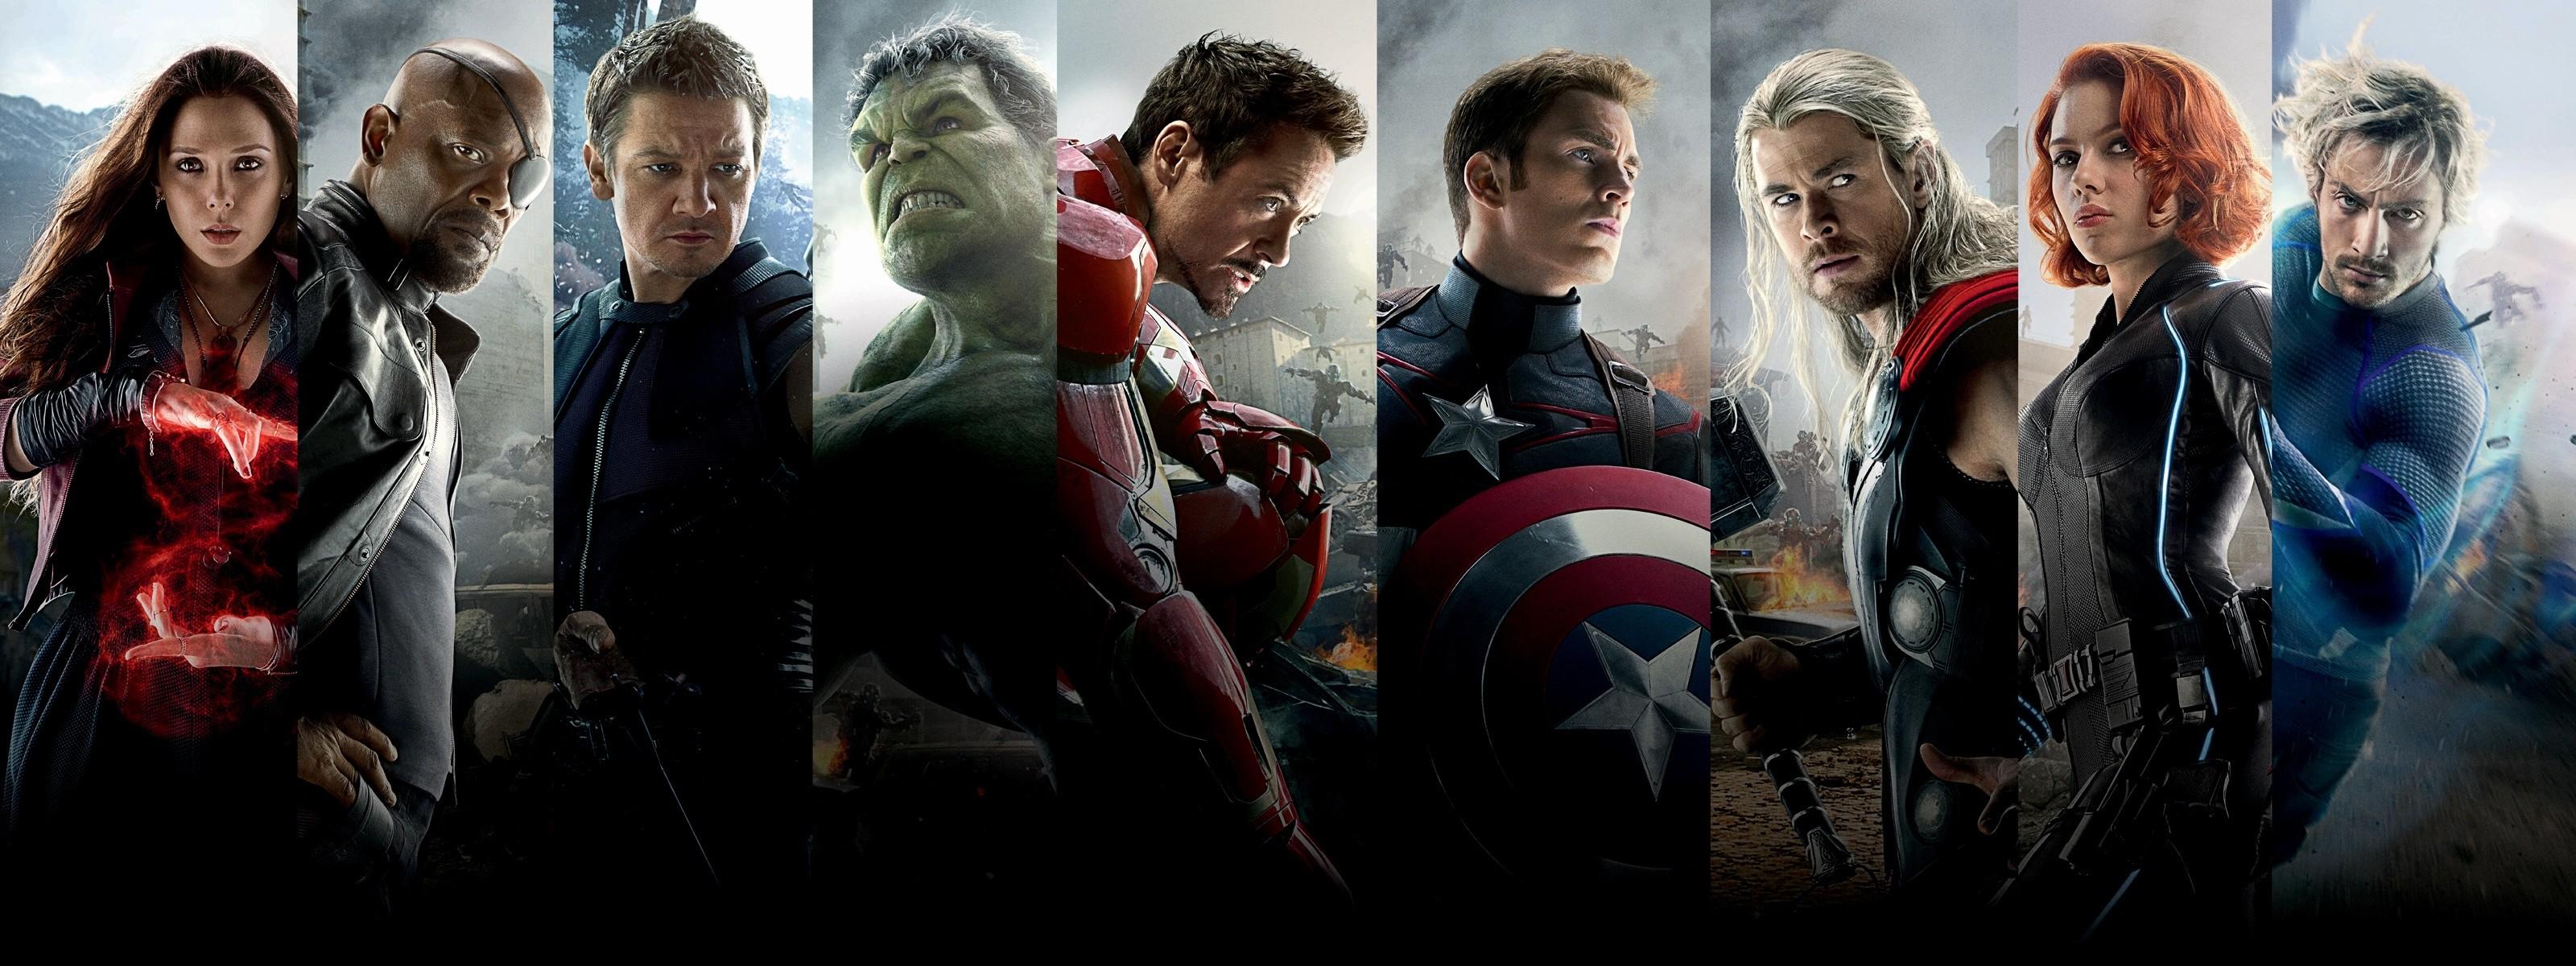 General 3200x1200 The Avengers Iron Man Hulk Captain America Nick Fury Thor